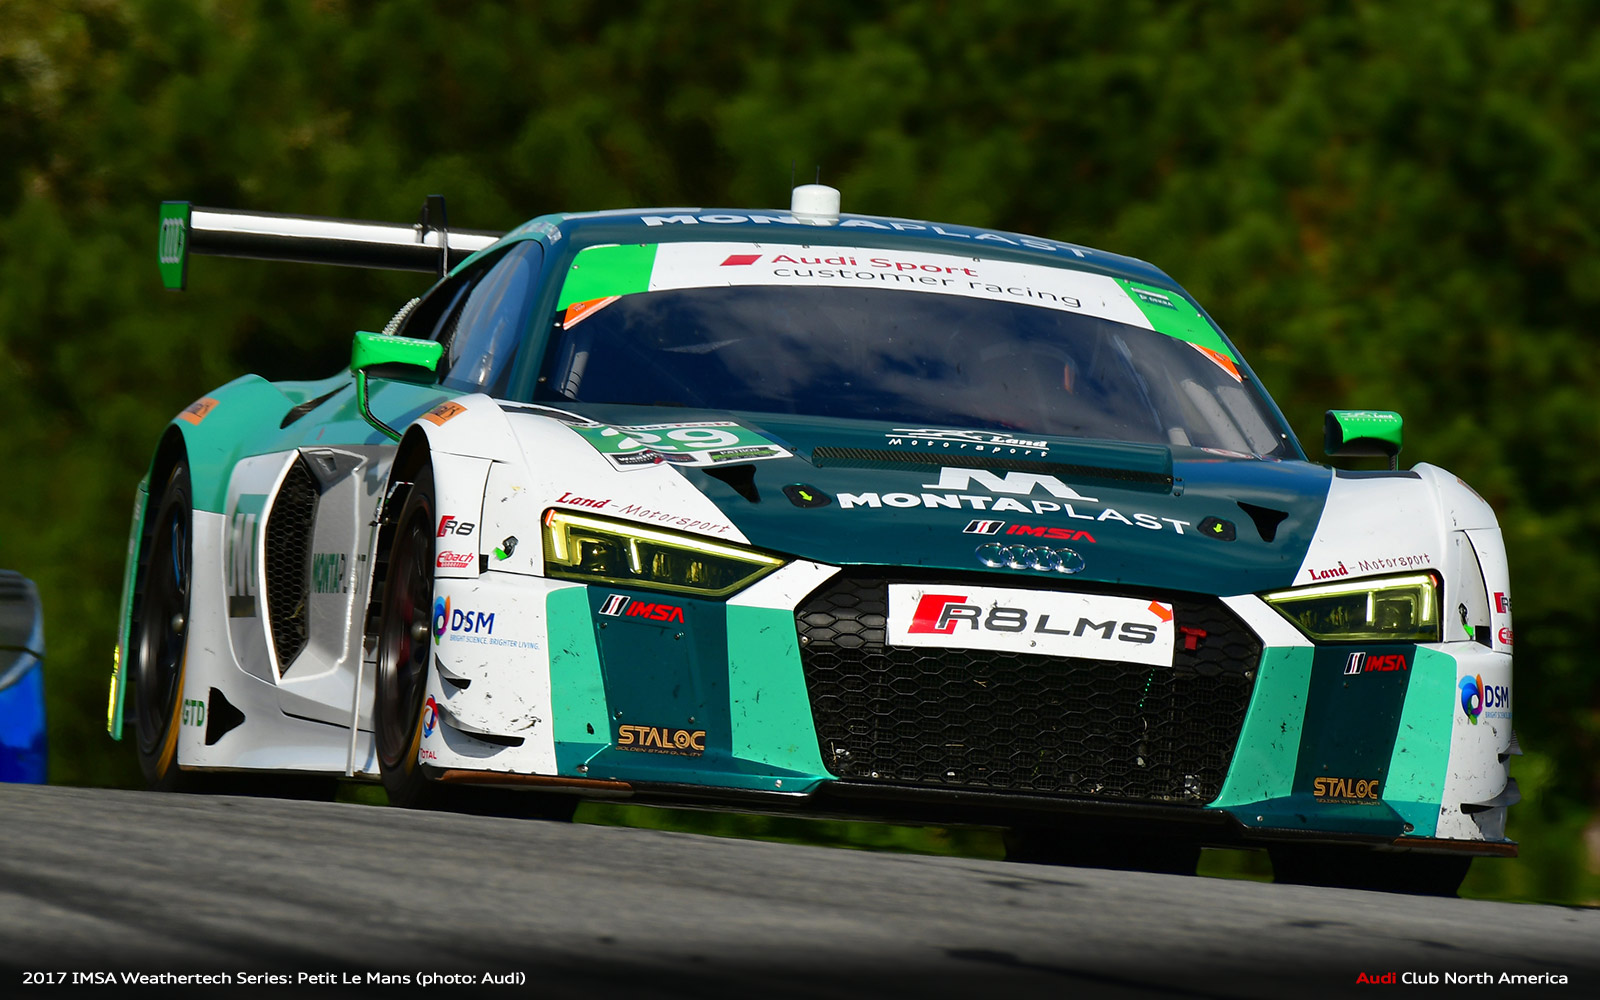 IMSA: Audi Wins Petit Le Mans